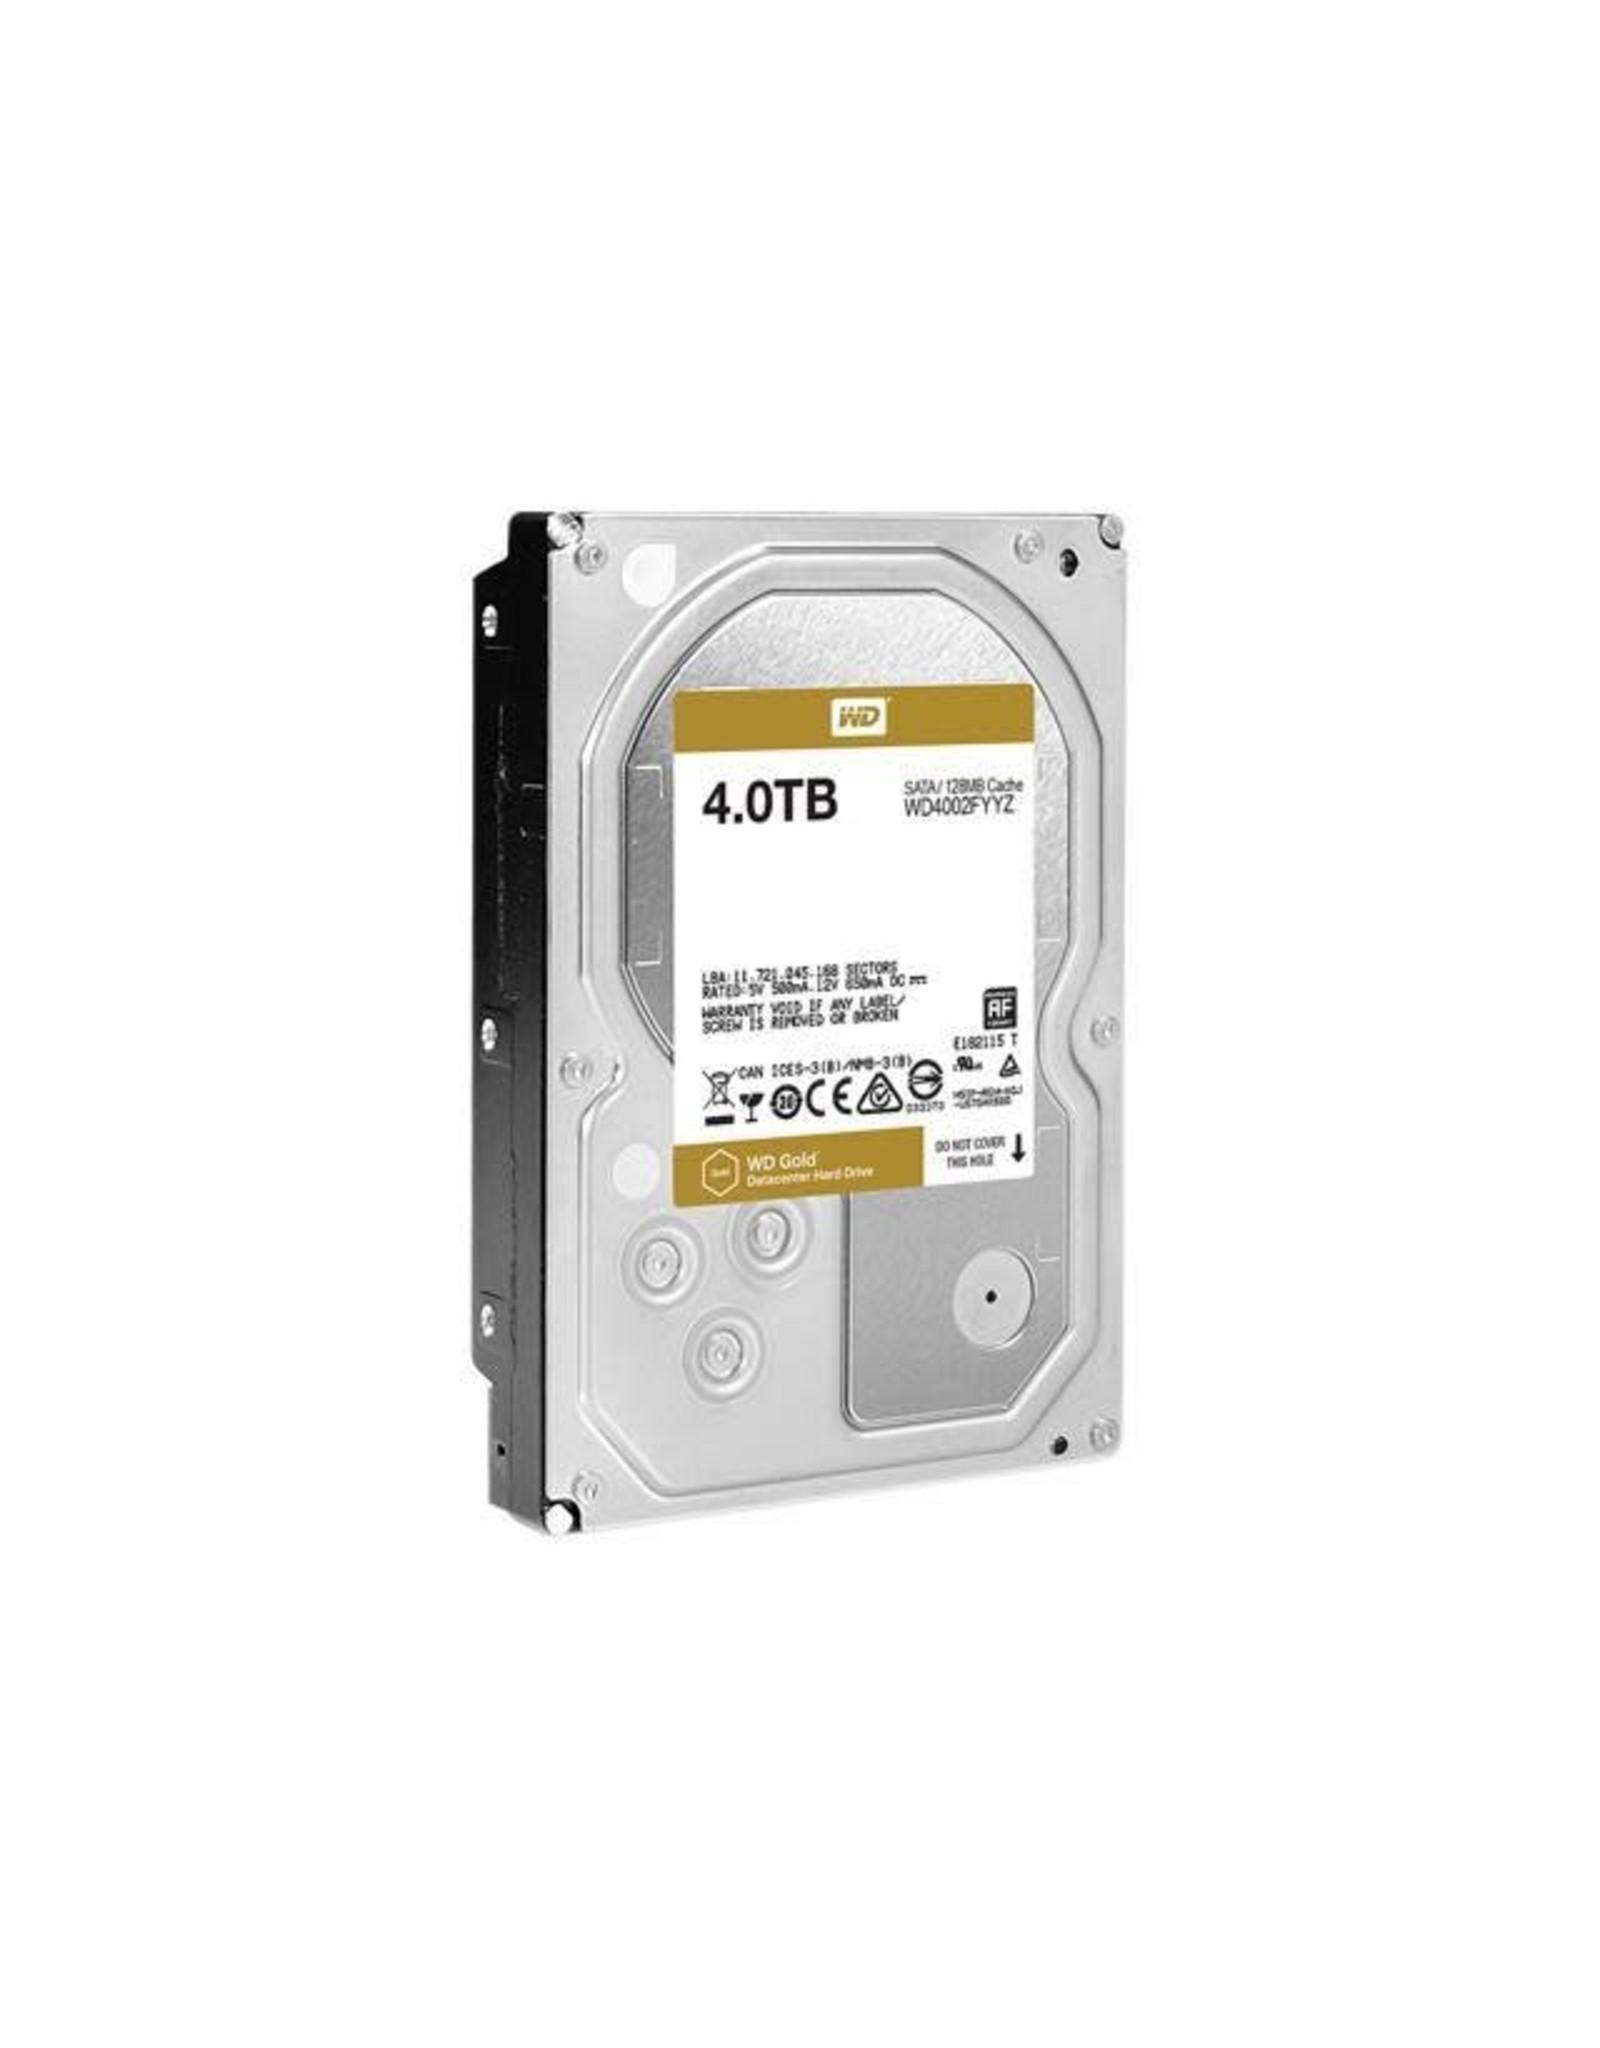 Western Digital Hard Drive - Western Digital GOLD 4TB SATA 6Gb/s 256MB